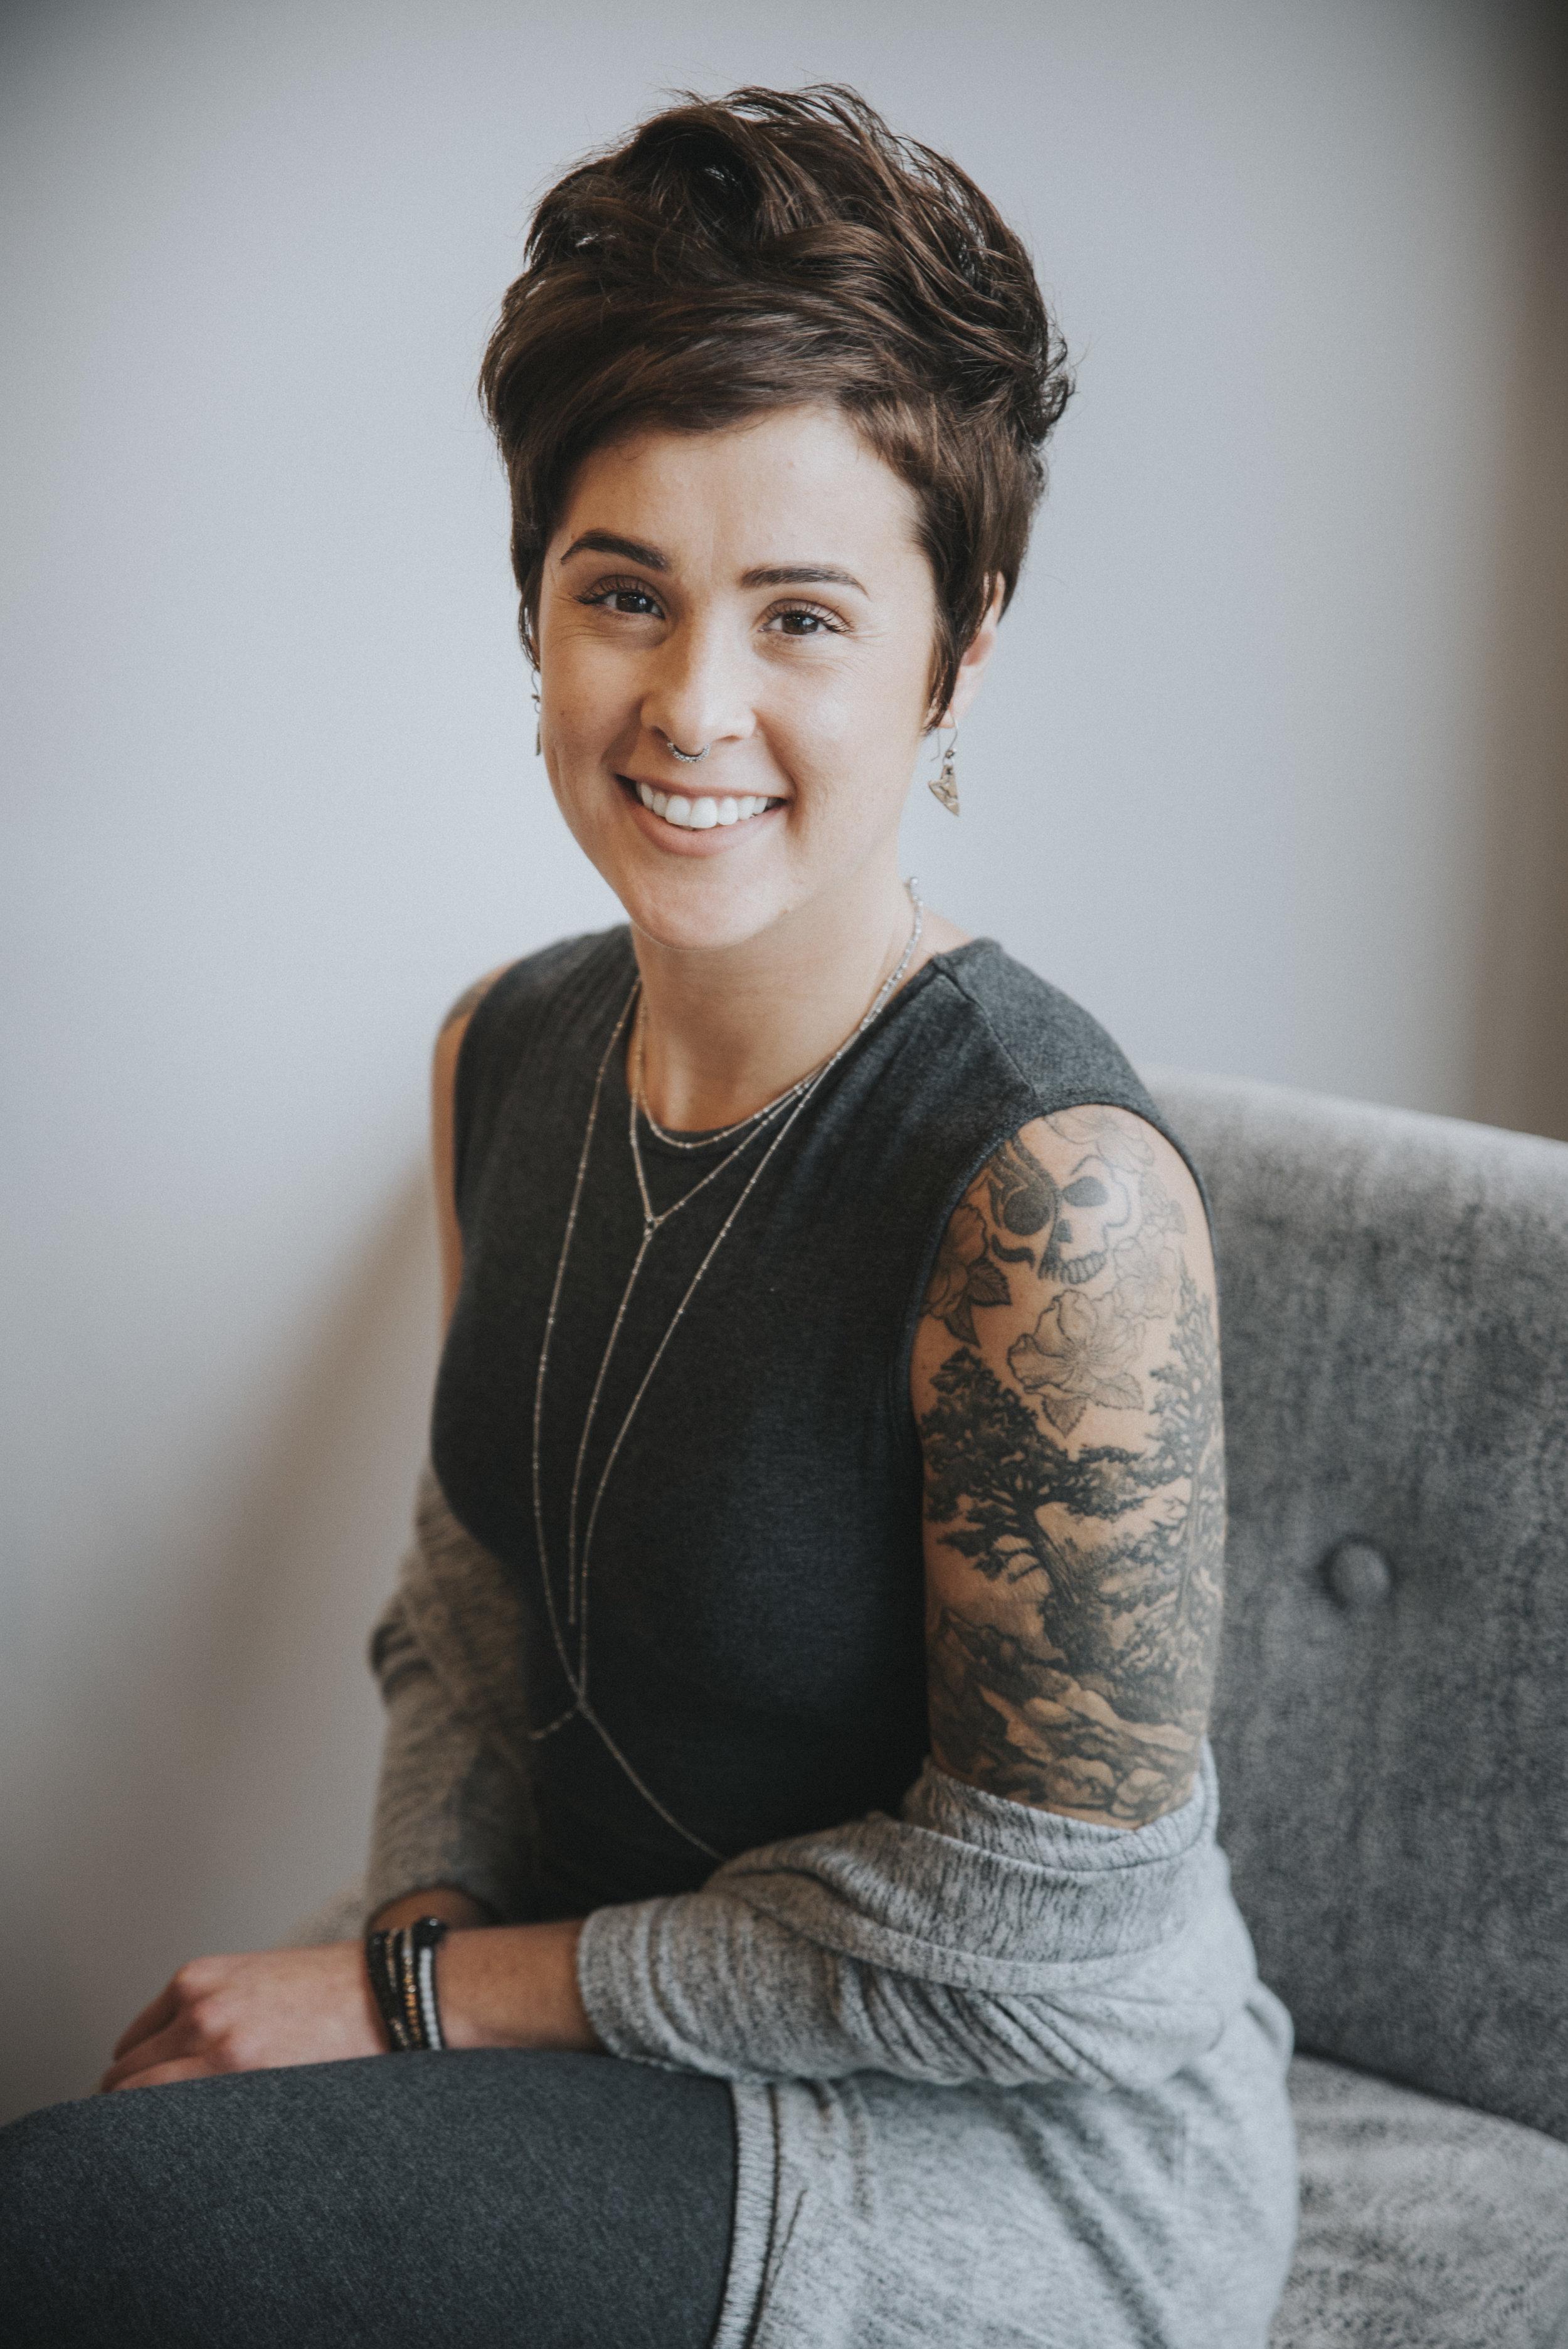 Melanie Orr Photography - Belle's Haircare Boutique Salon -4176.jpg